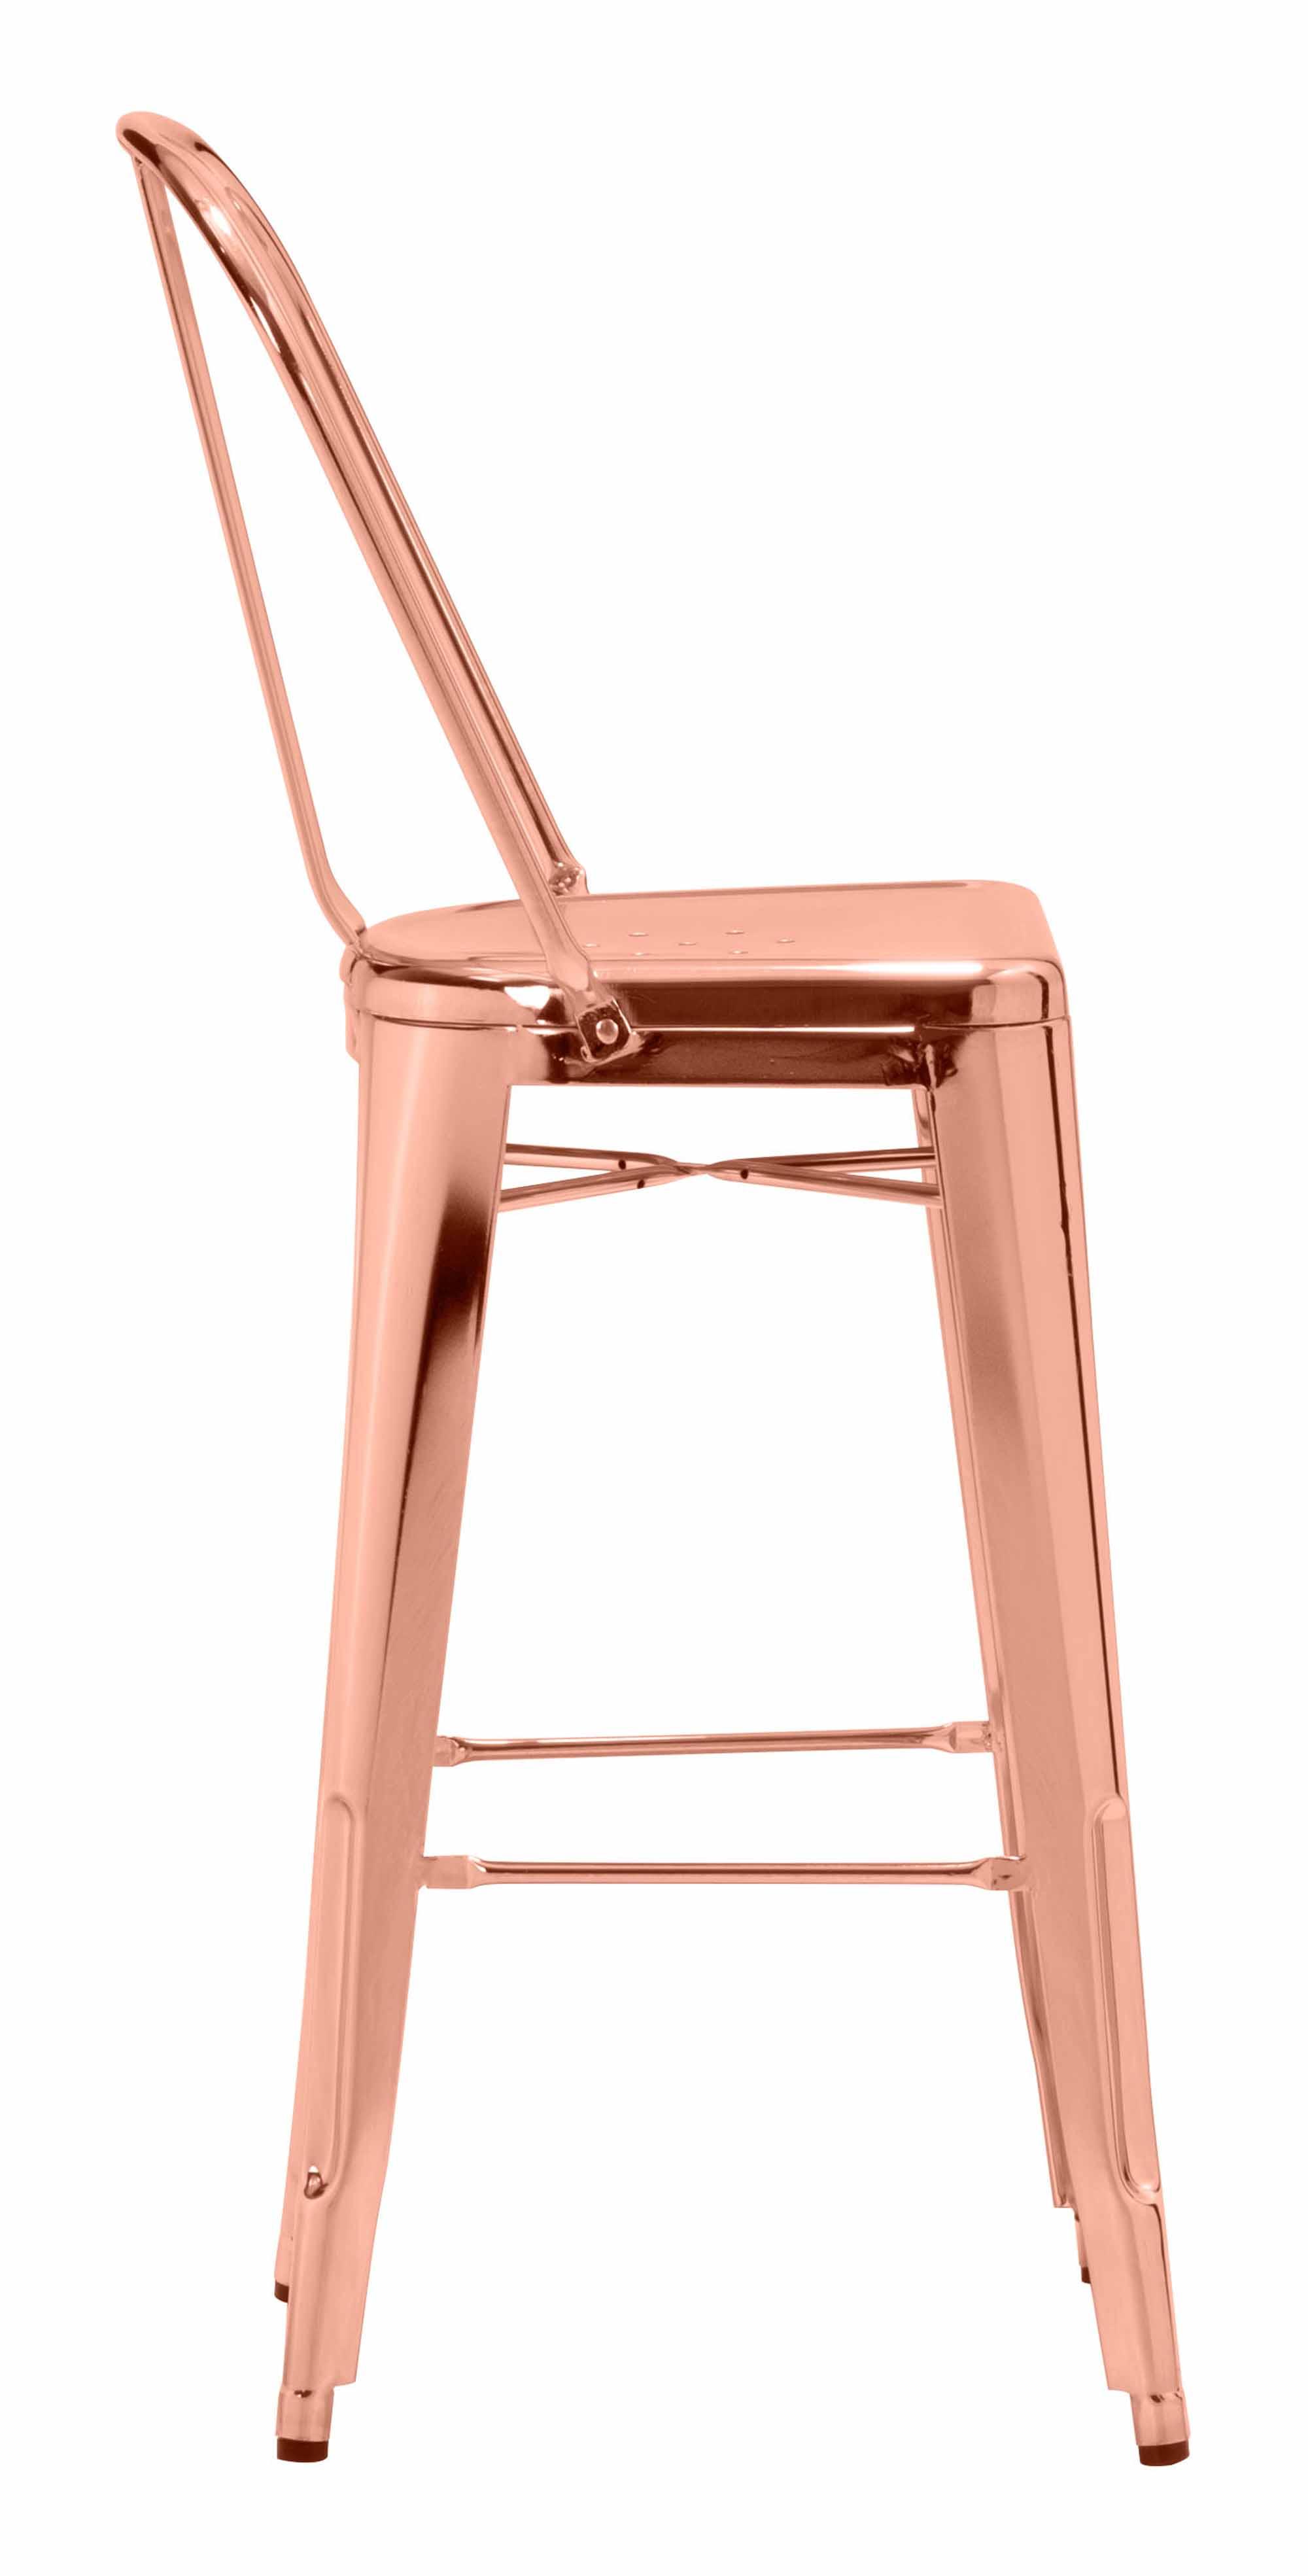 Elio Bar Chair Rose Gold by Zuo Modern : 108063 2 from futonland.com size 2000 x 3938 jpeg 219kB